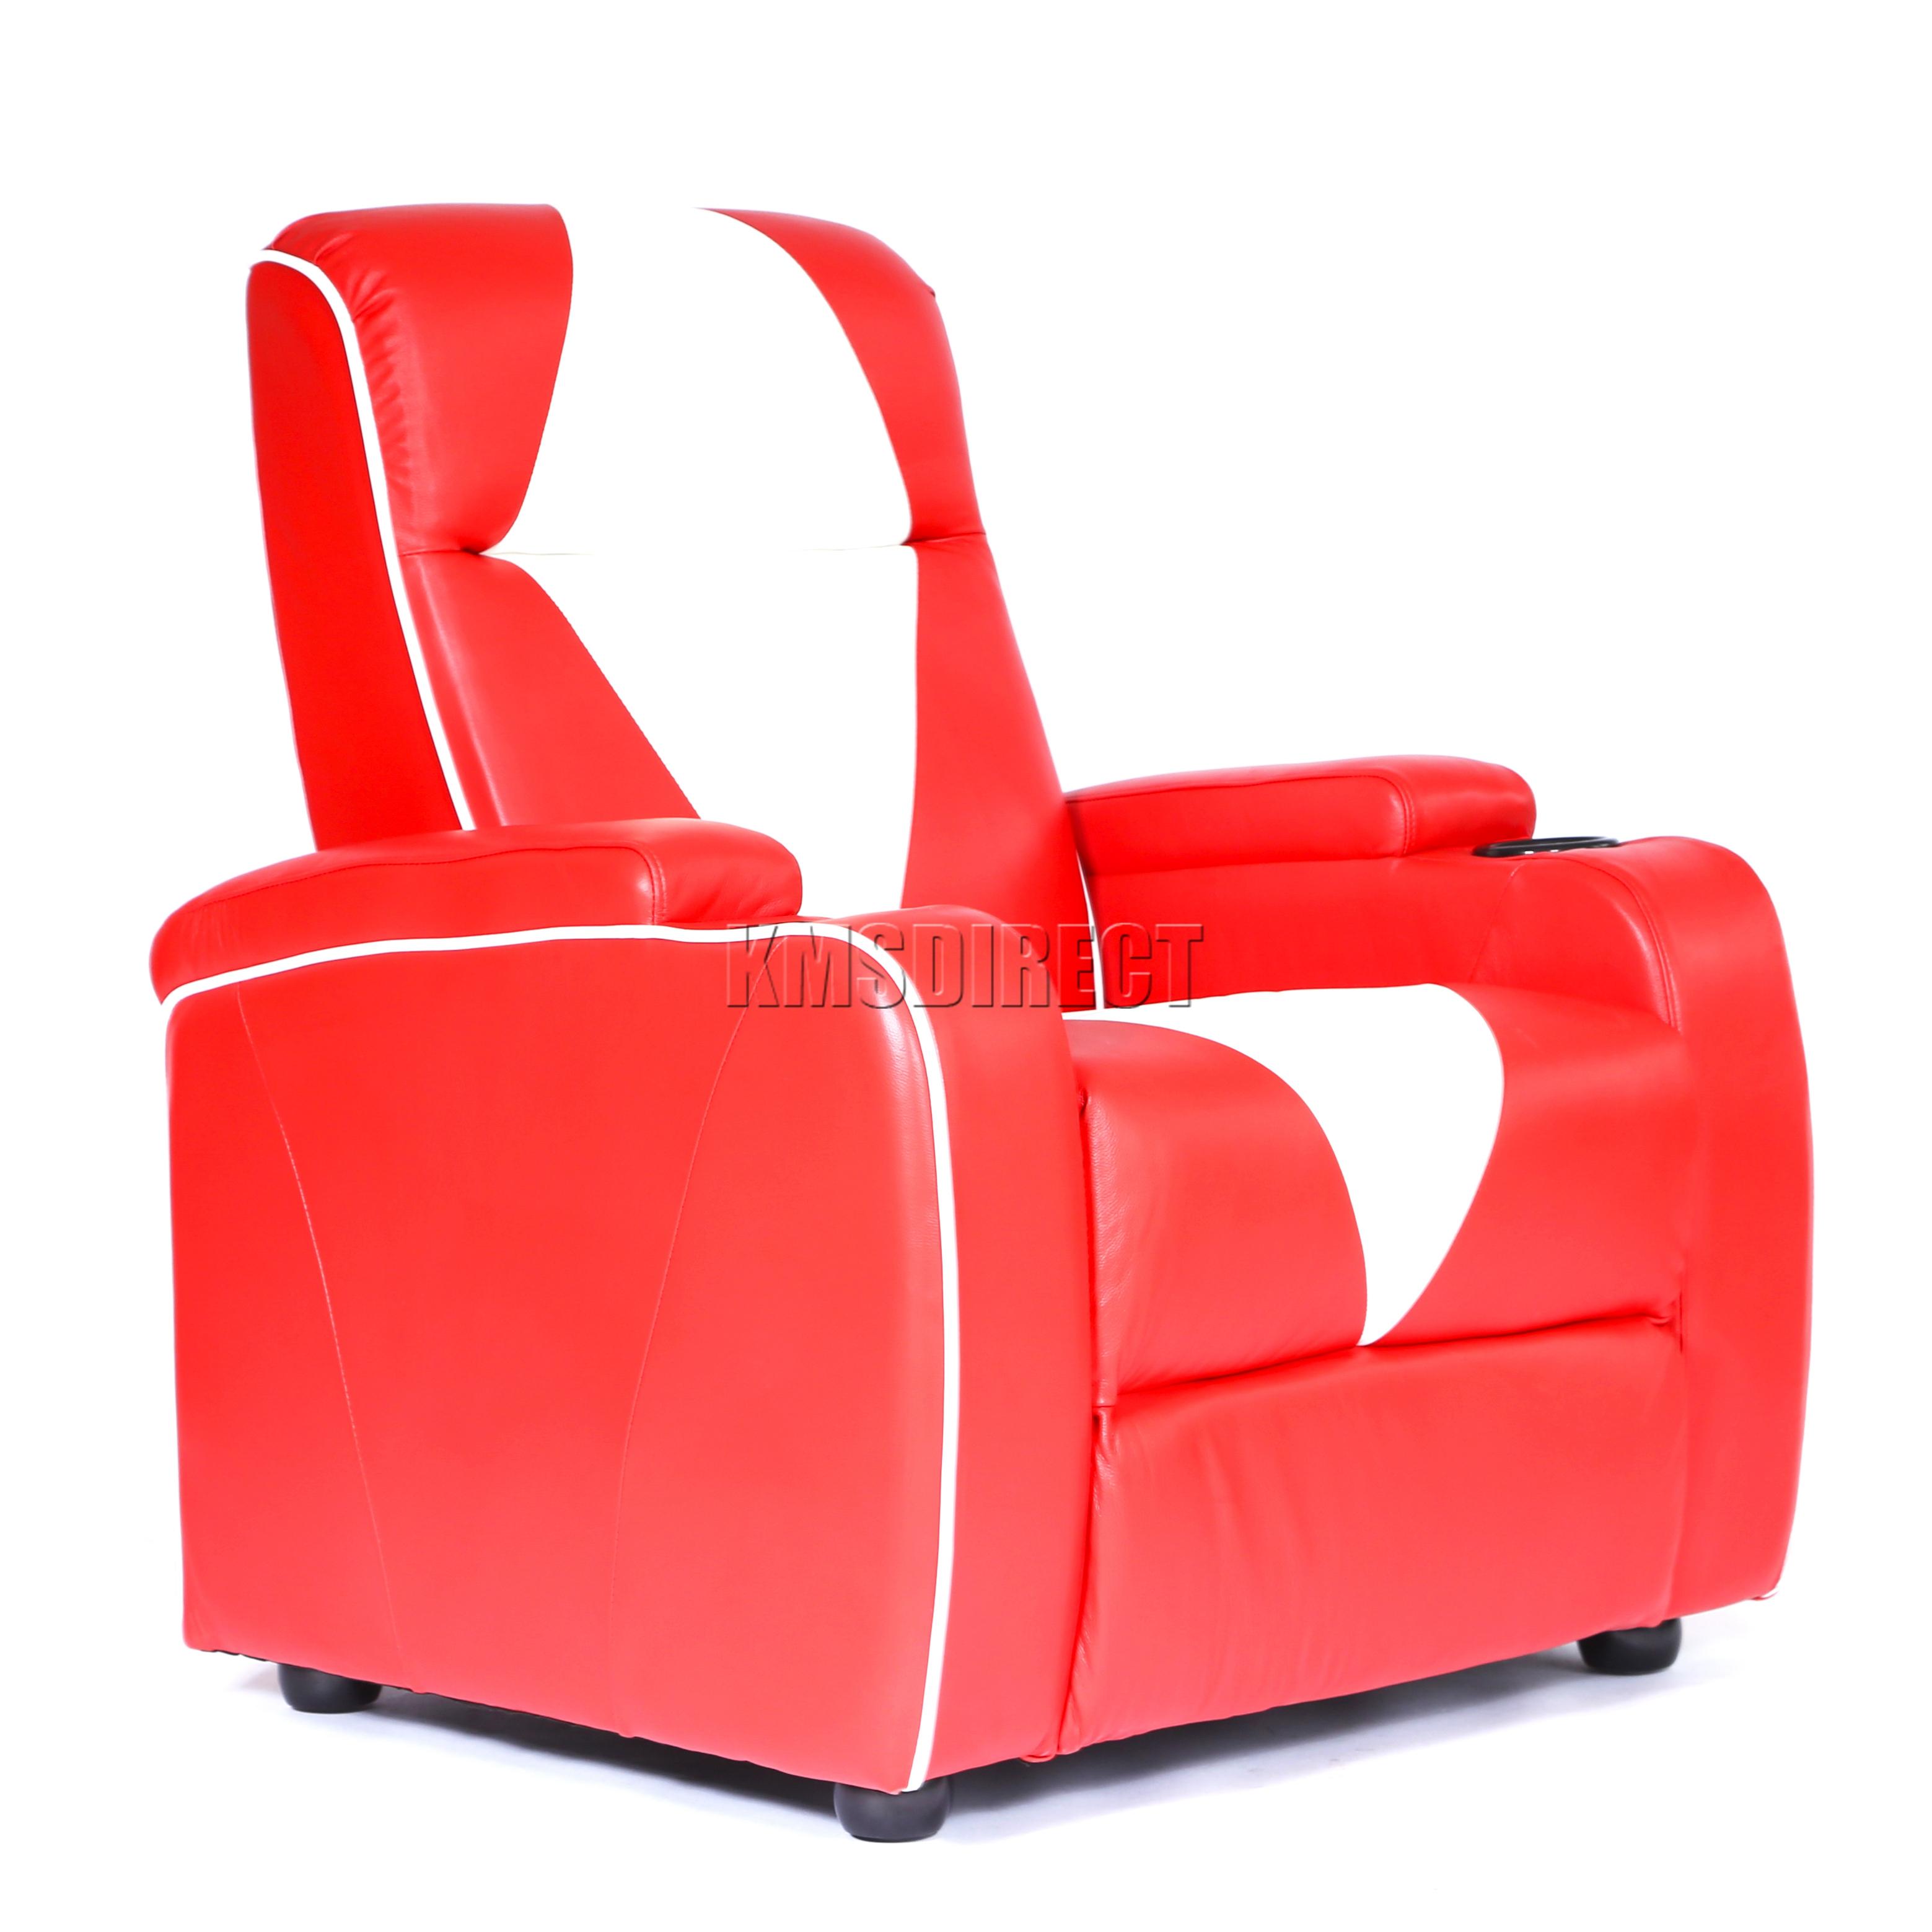 FoxHunter Leather Retro Theatre Cinema Movie Chair Sofa Electric